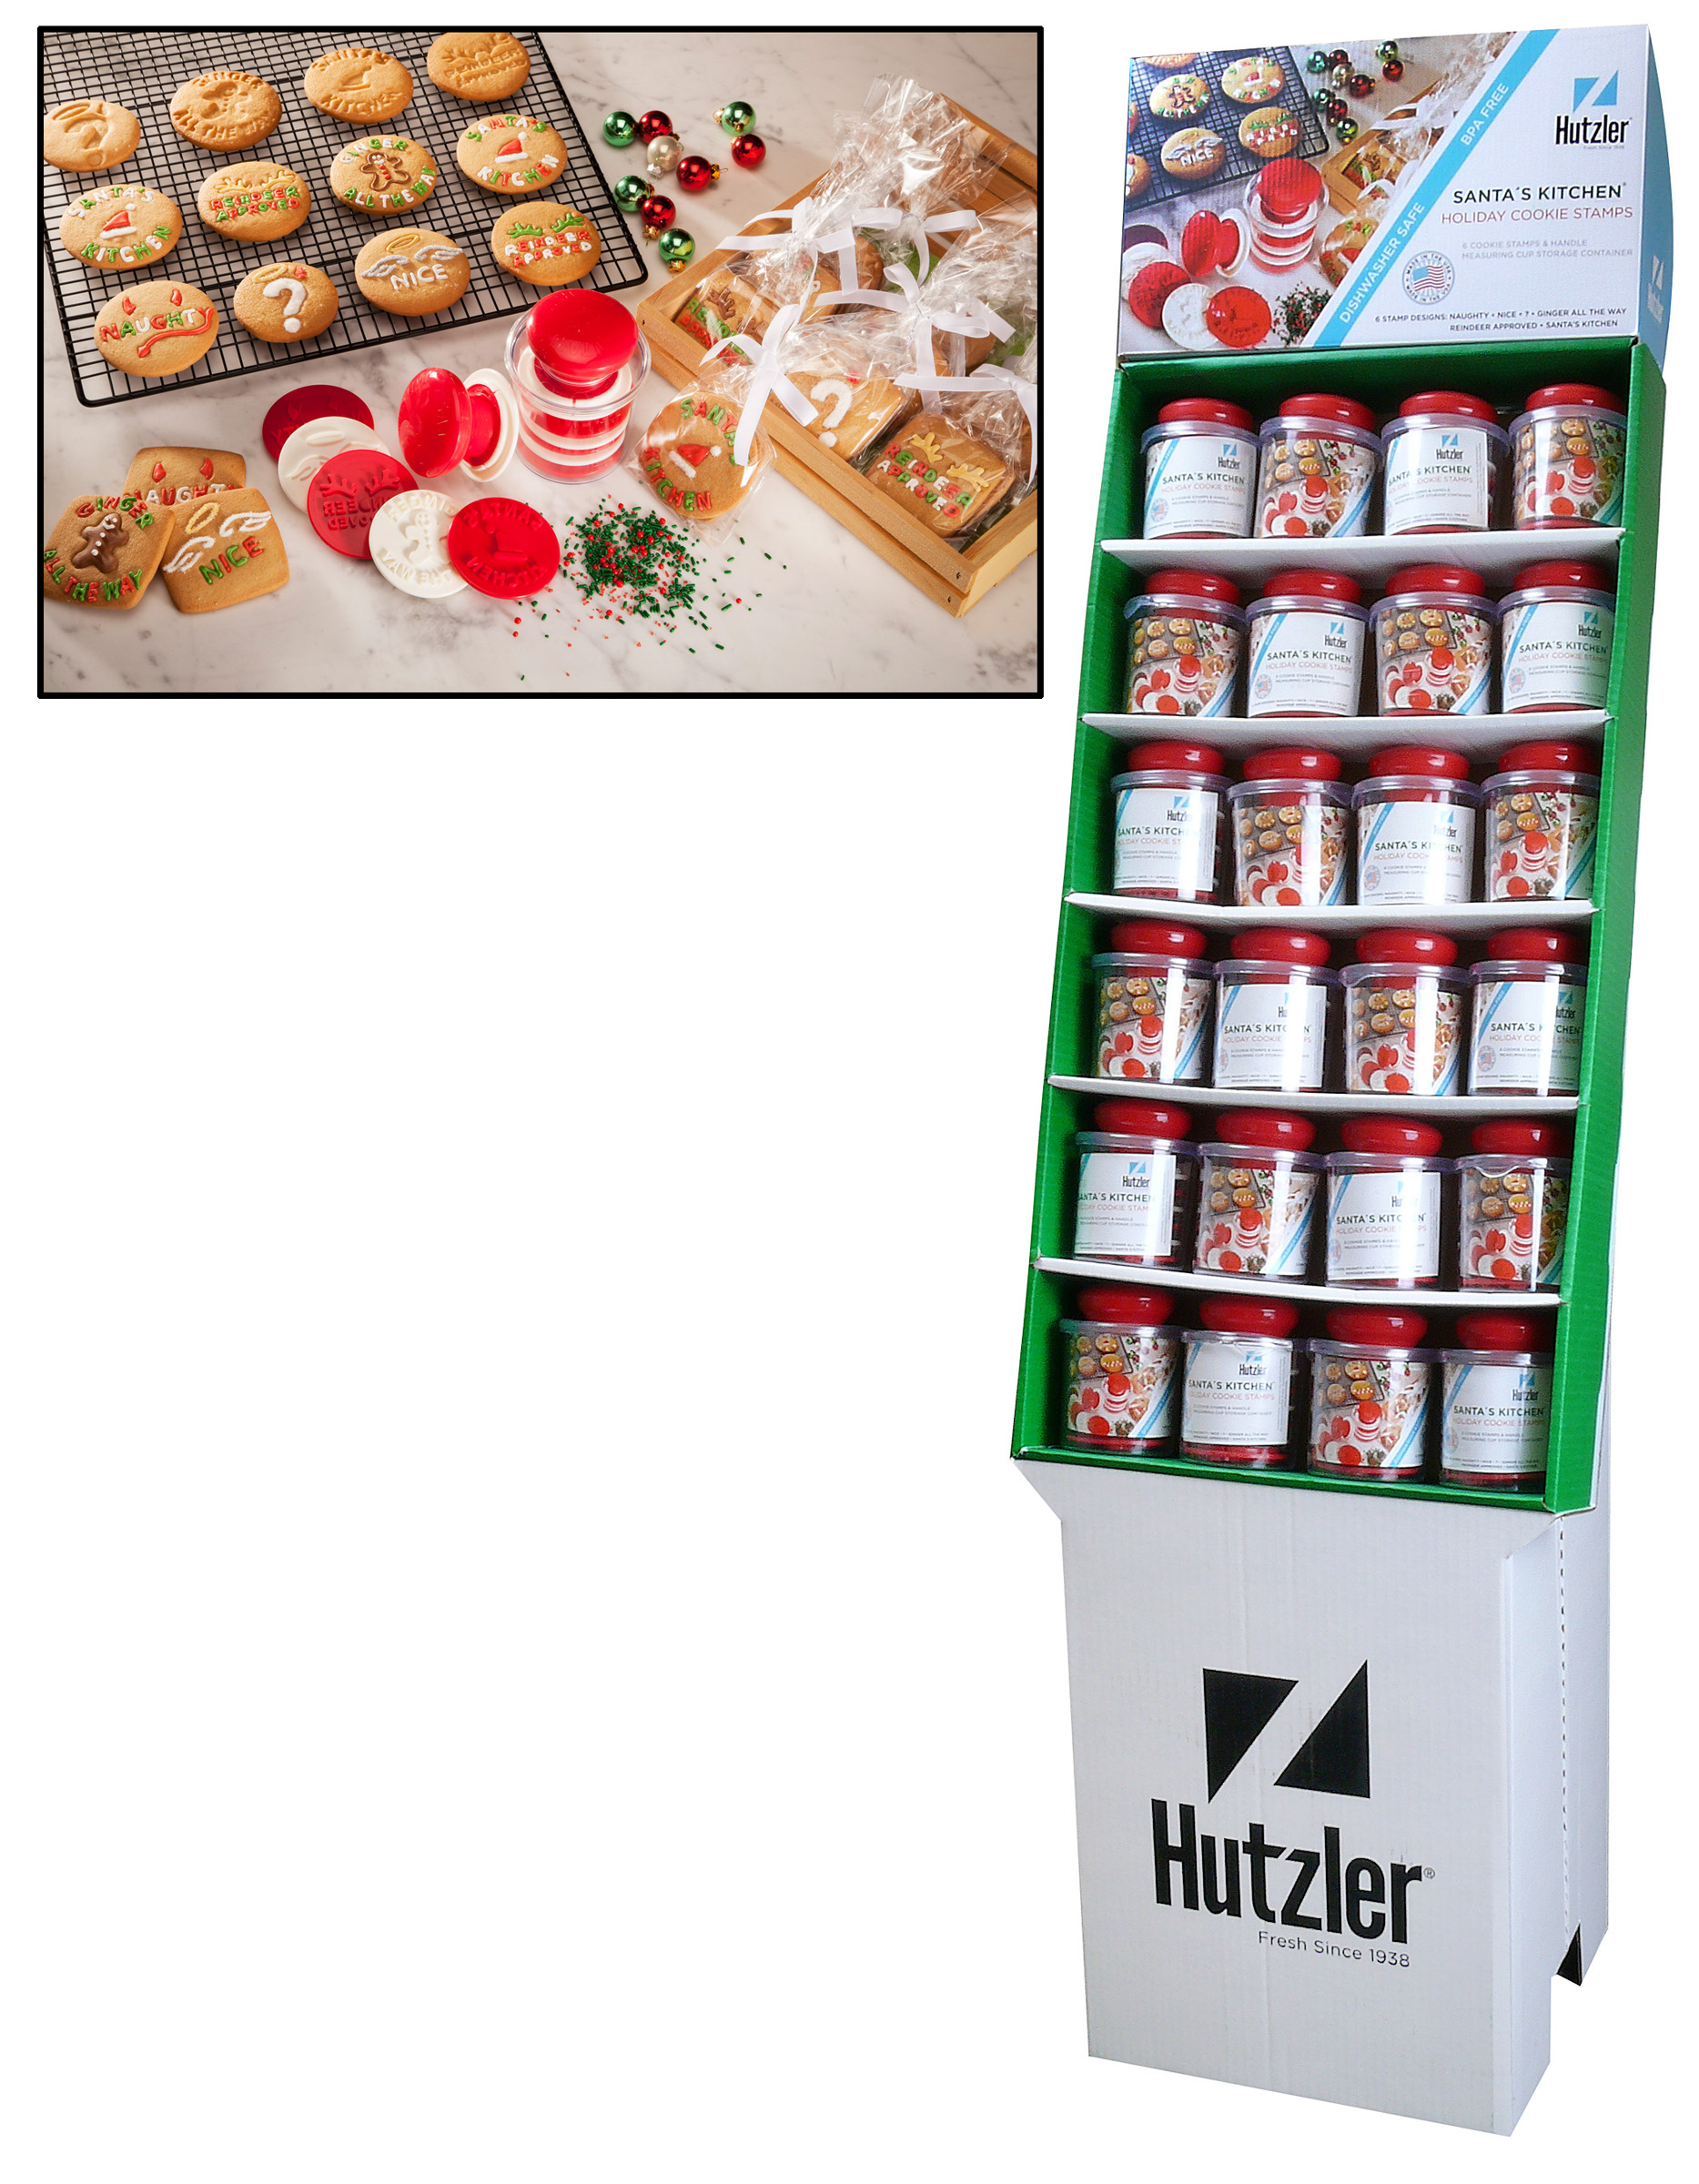 Hutzler 24-1906 Santa's Kitchen Holiday Cookie Stamps Floor Display (24 pack)